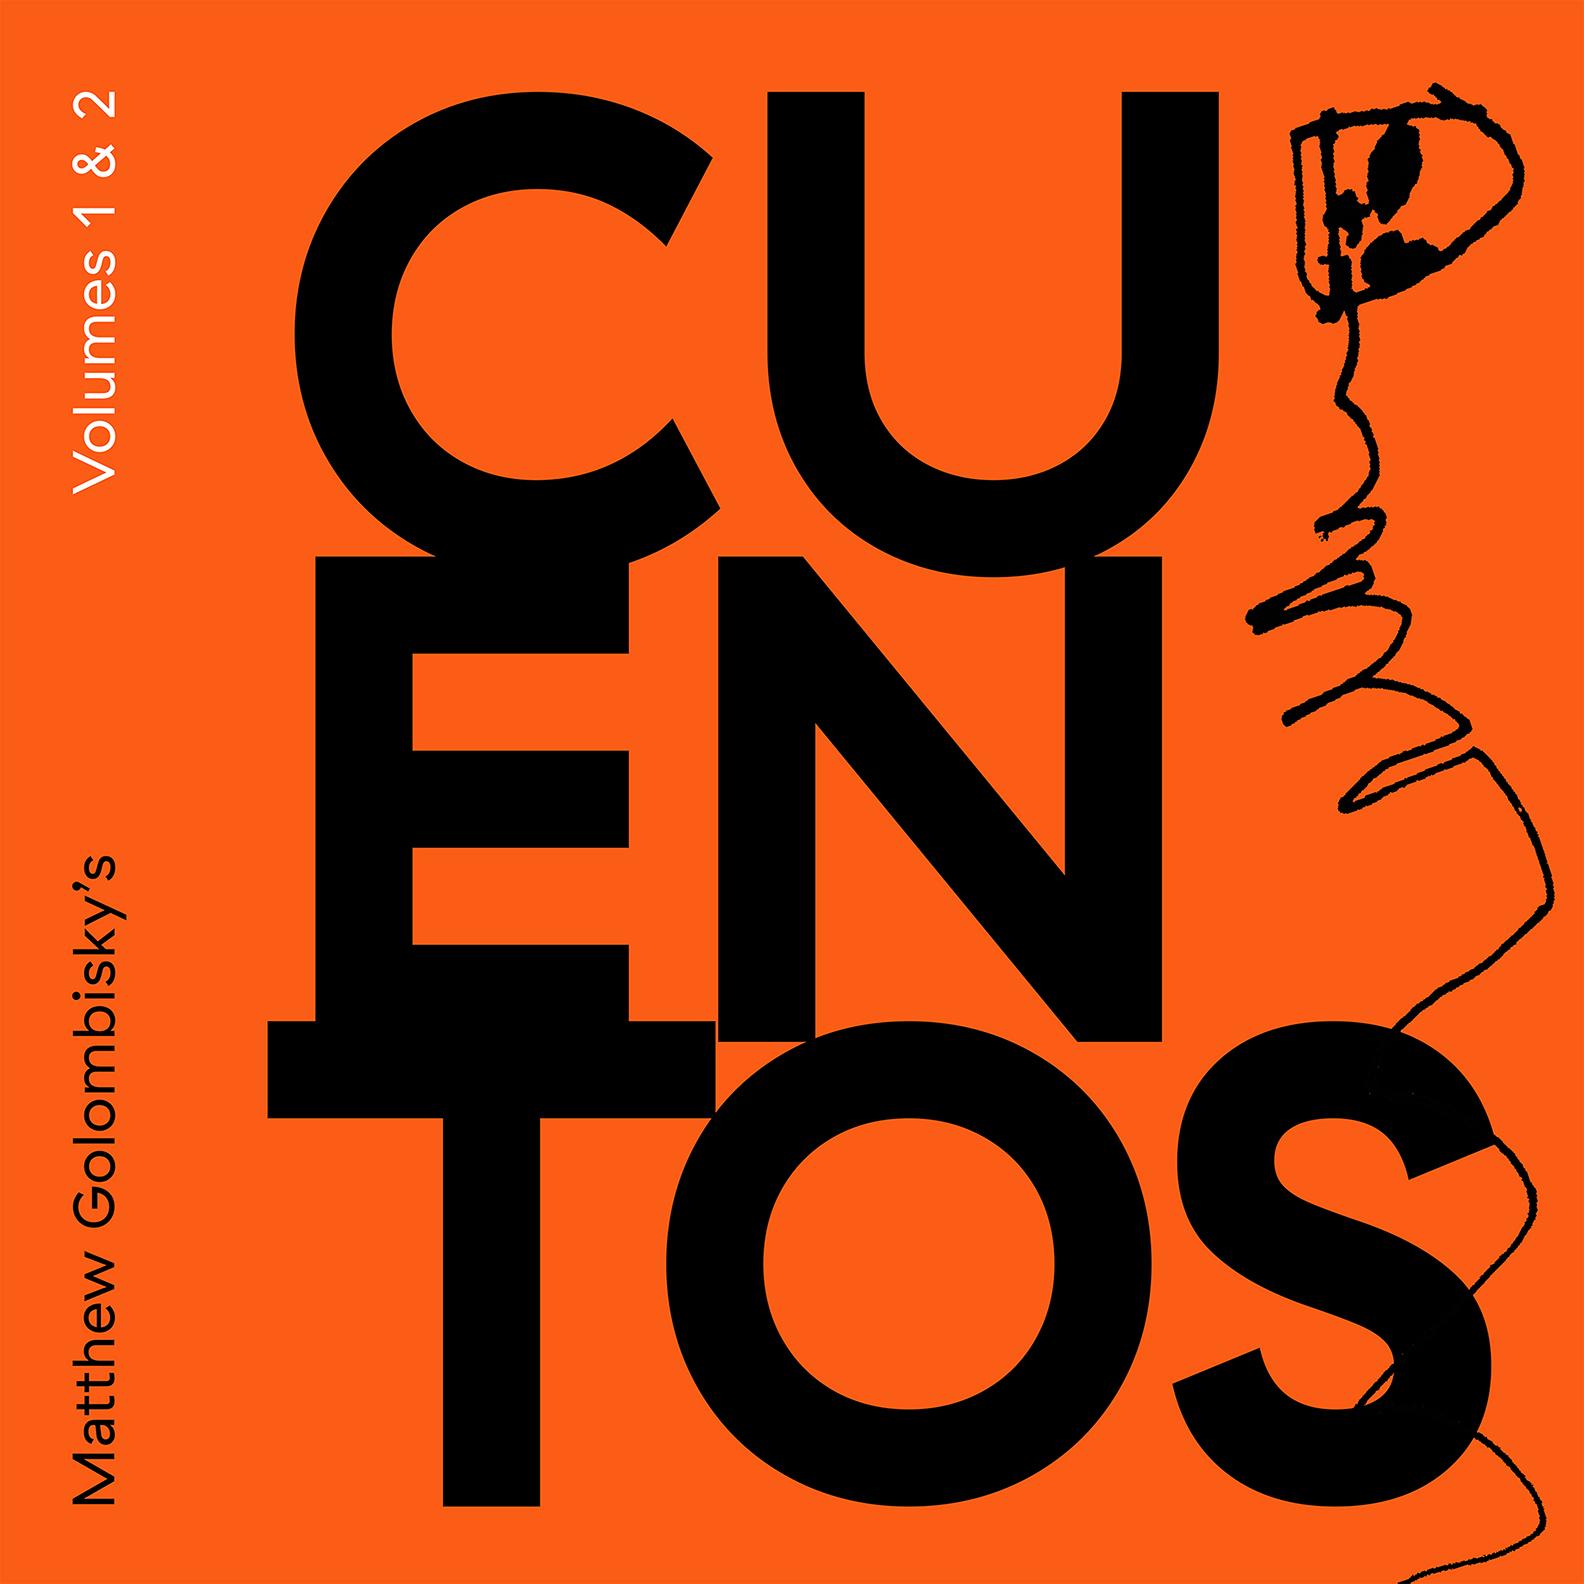 Matthew Golombisky's Cuentos Vol. 1 & 2